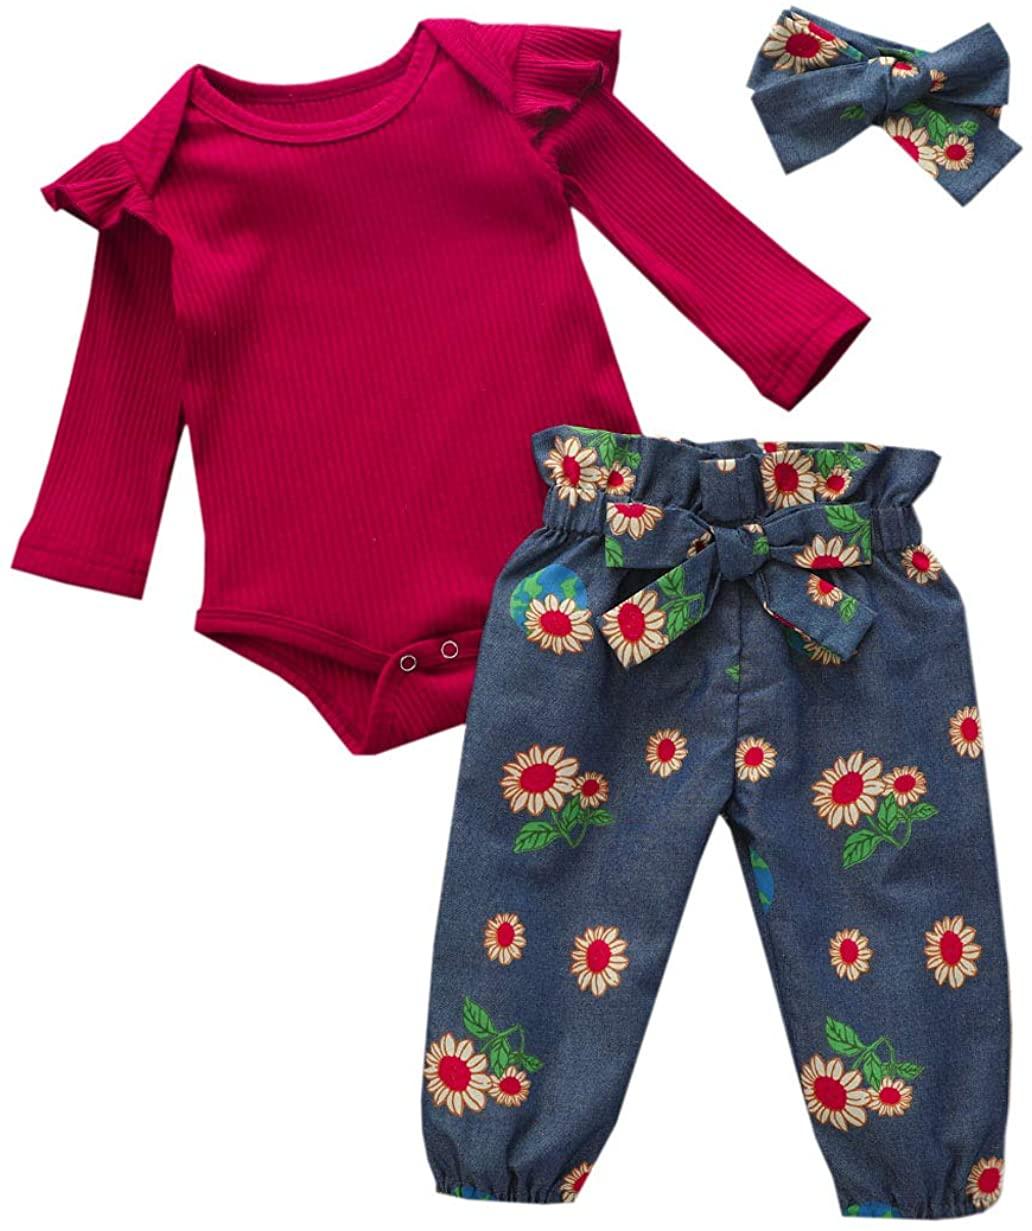 Cute Newborn Baby Girl Solid Long Sleeve Romper Bodysuit Top + Sunflower Long Pants + Headband 0-24M Baby Girl Outfit